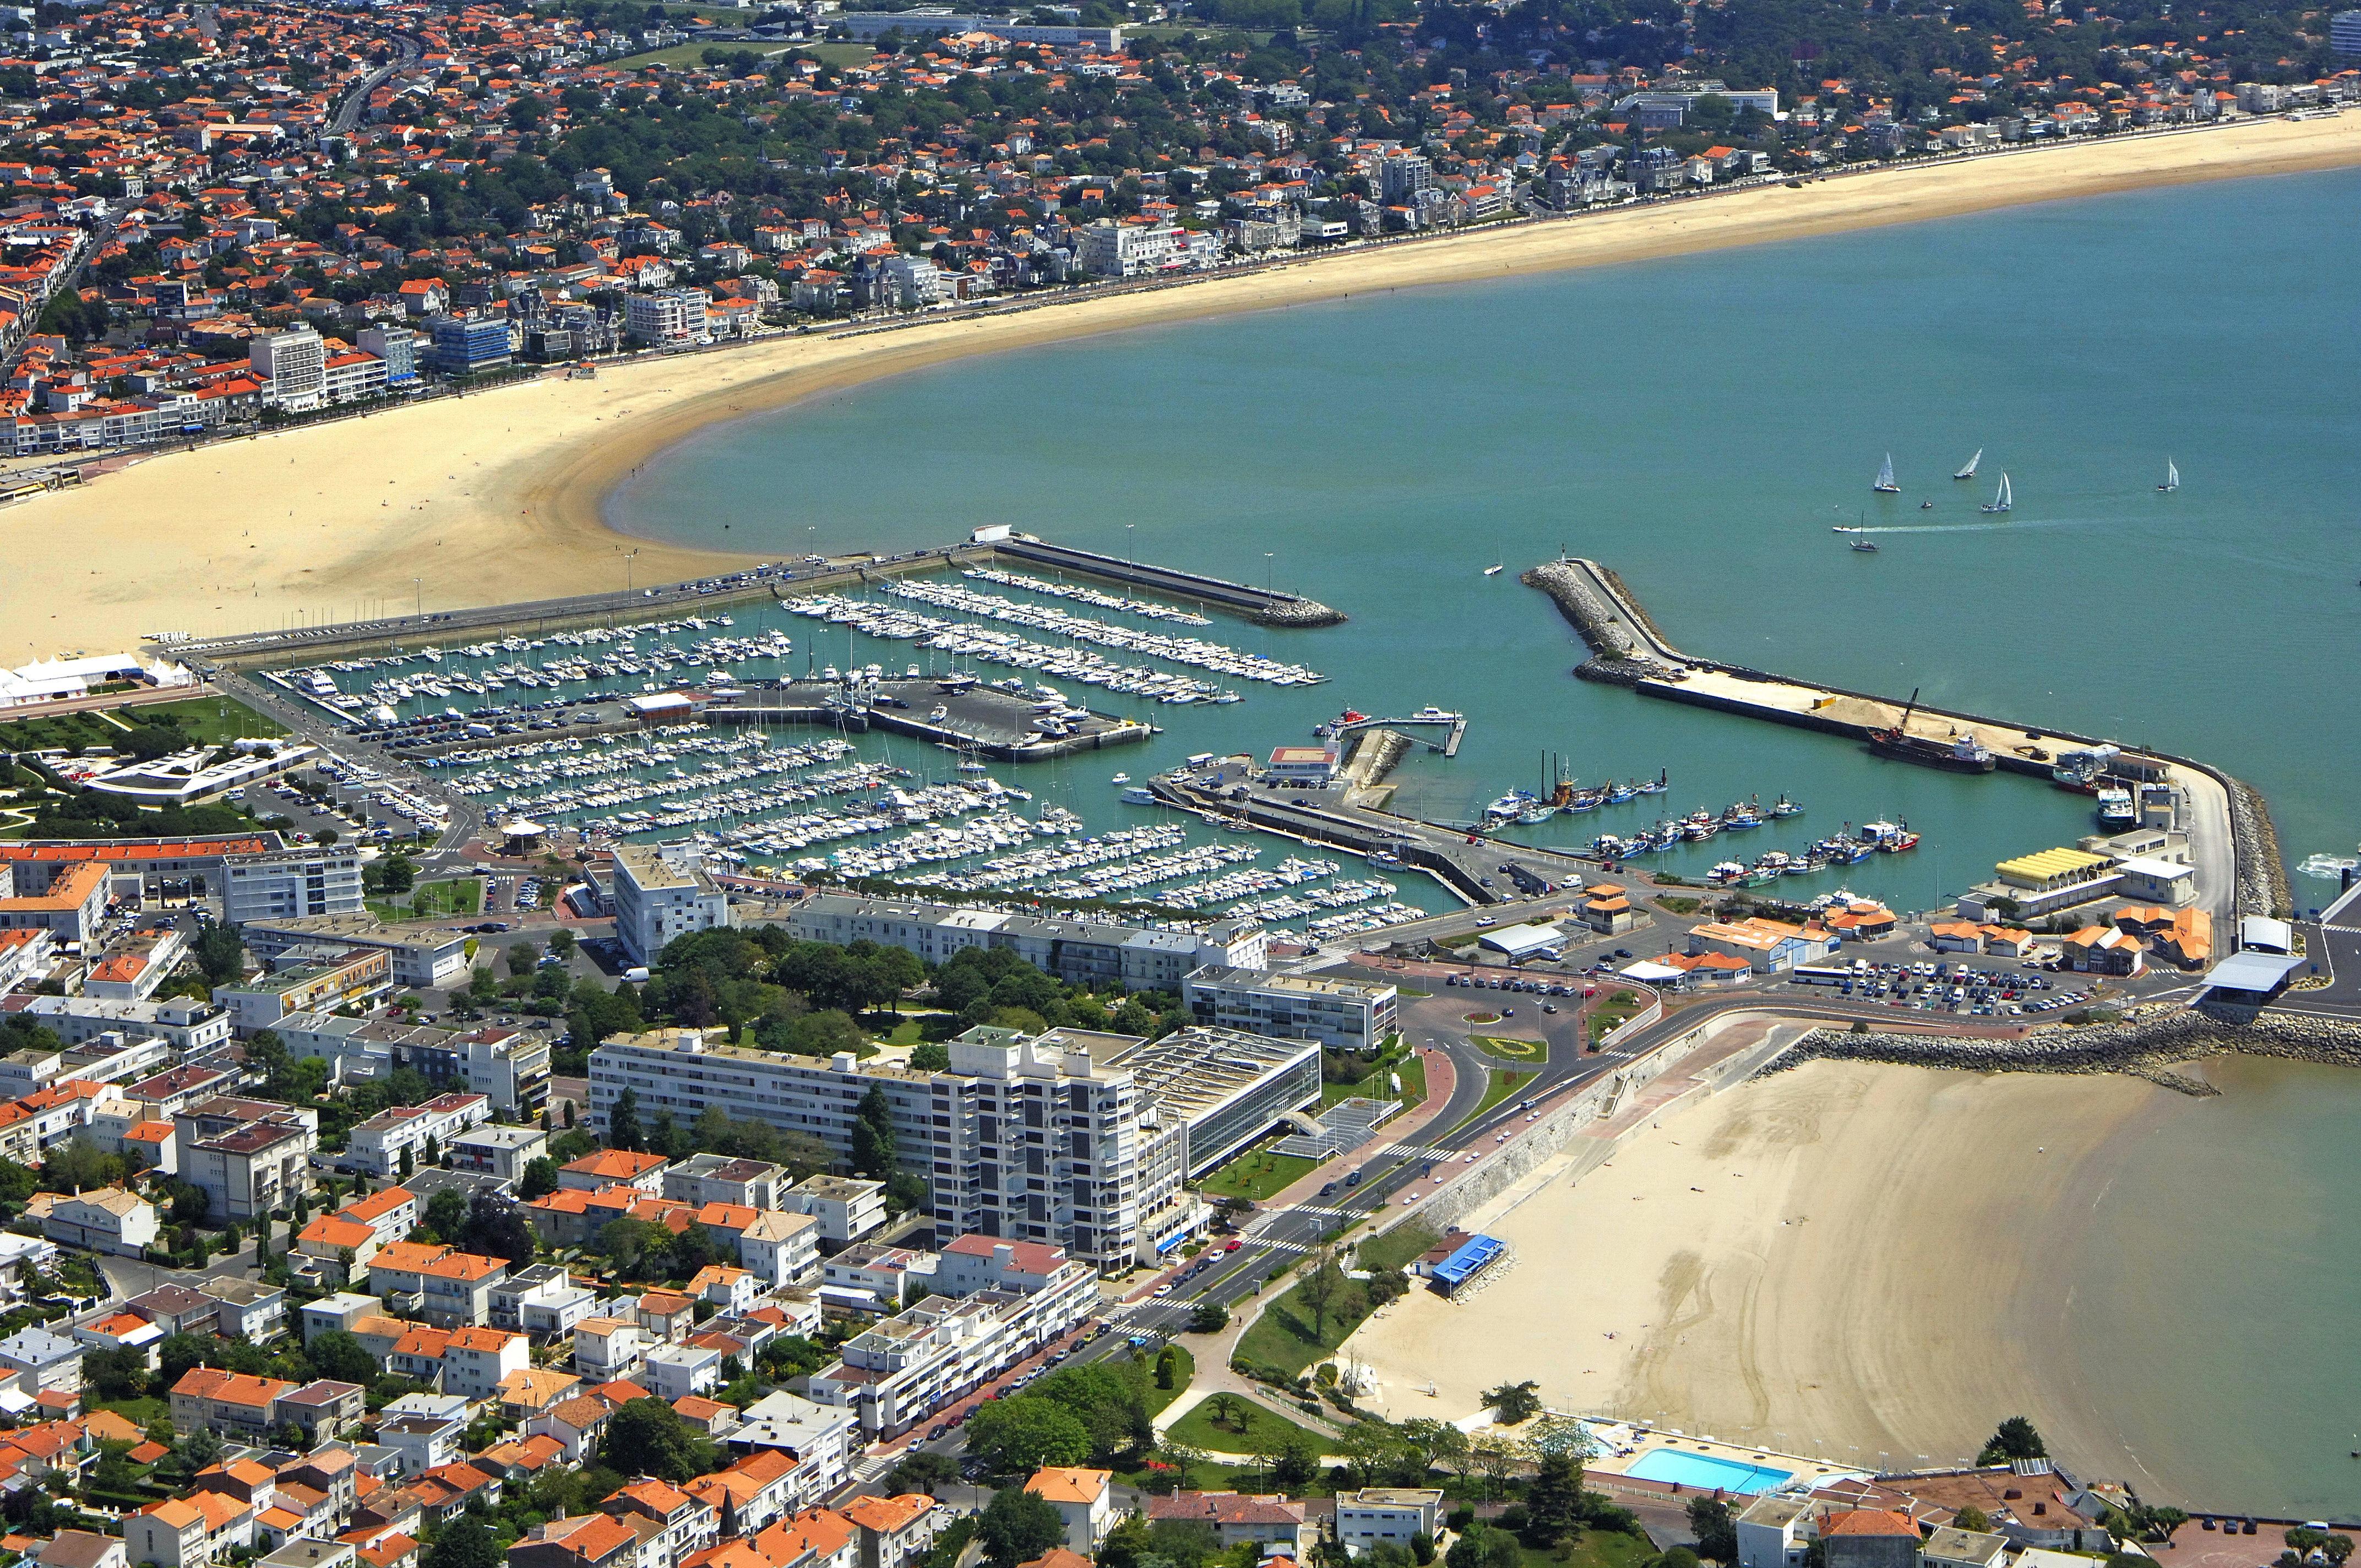 Royan Marina in Royan, Poitou-Charentes, France - Marina